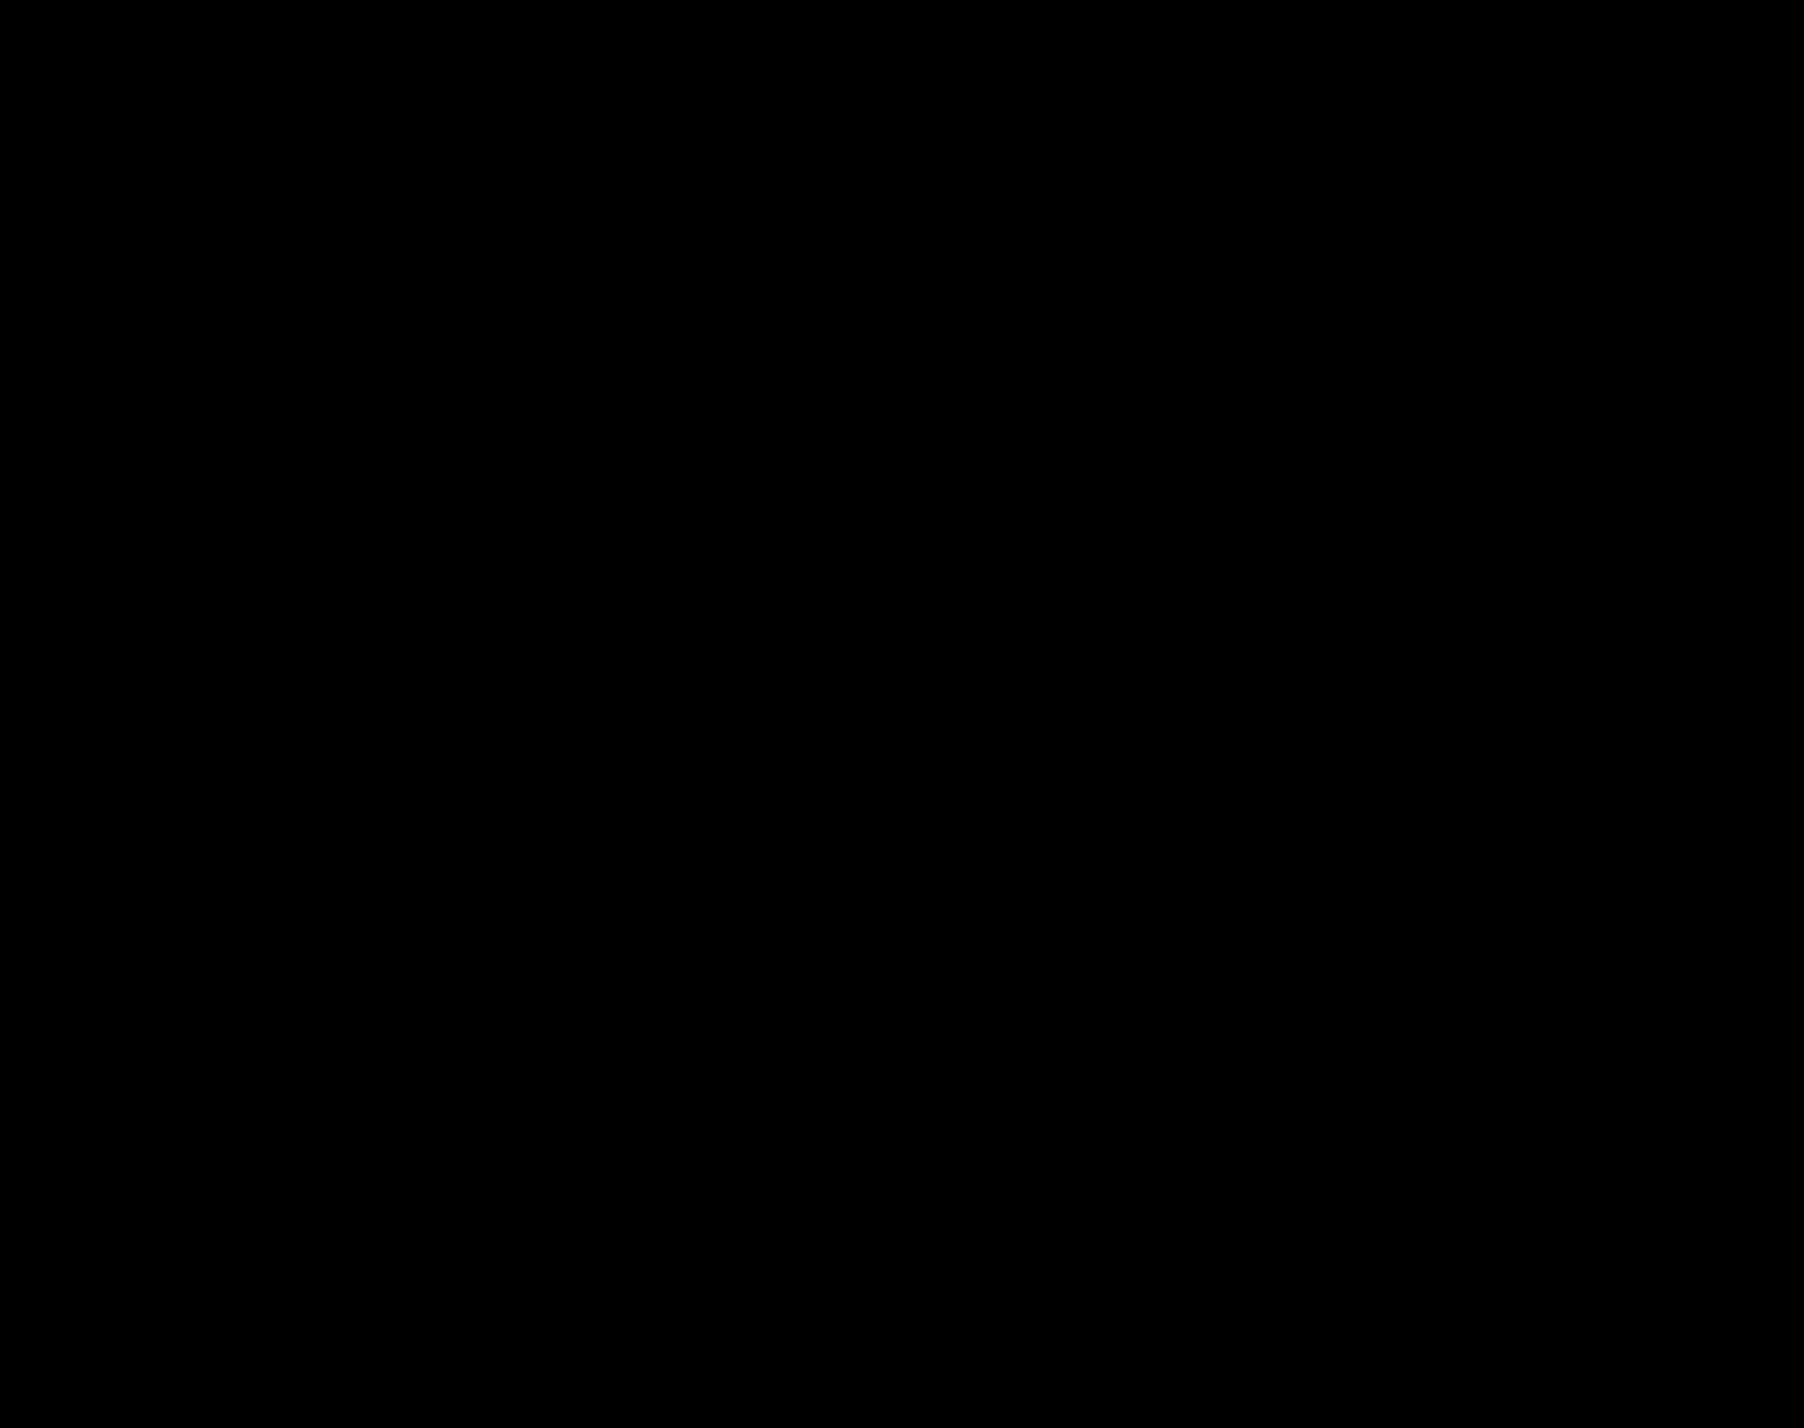 Illustration of a carpenter cutting wood 2